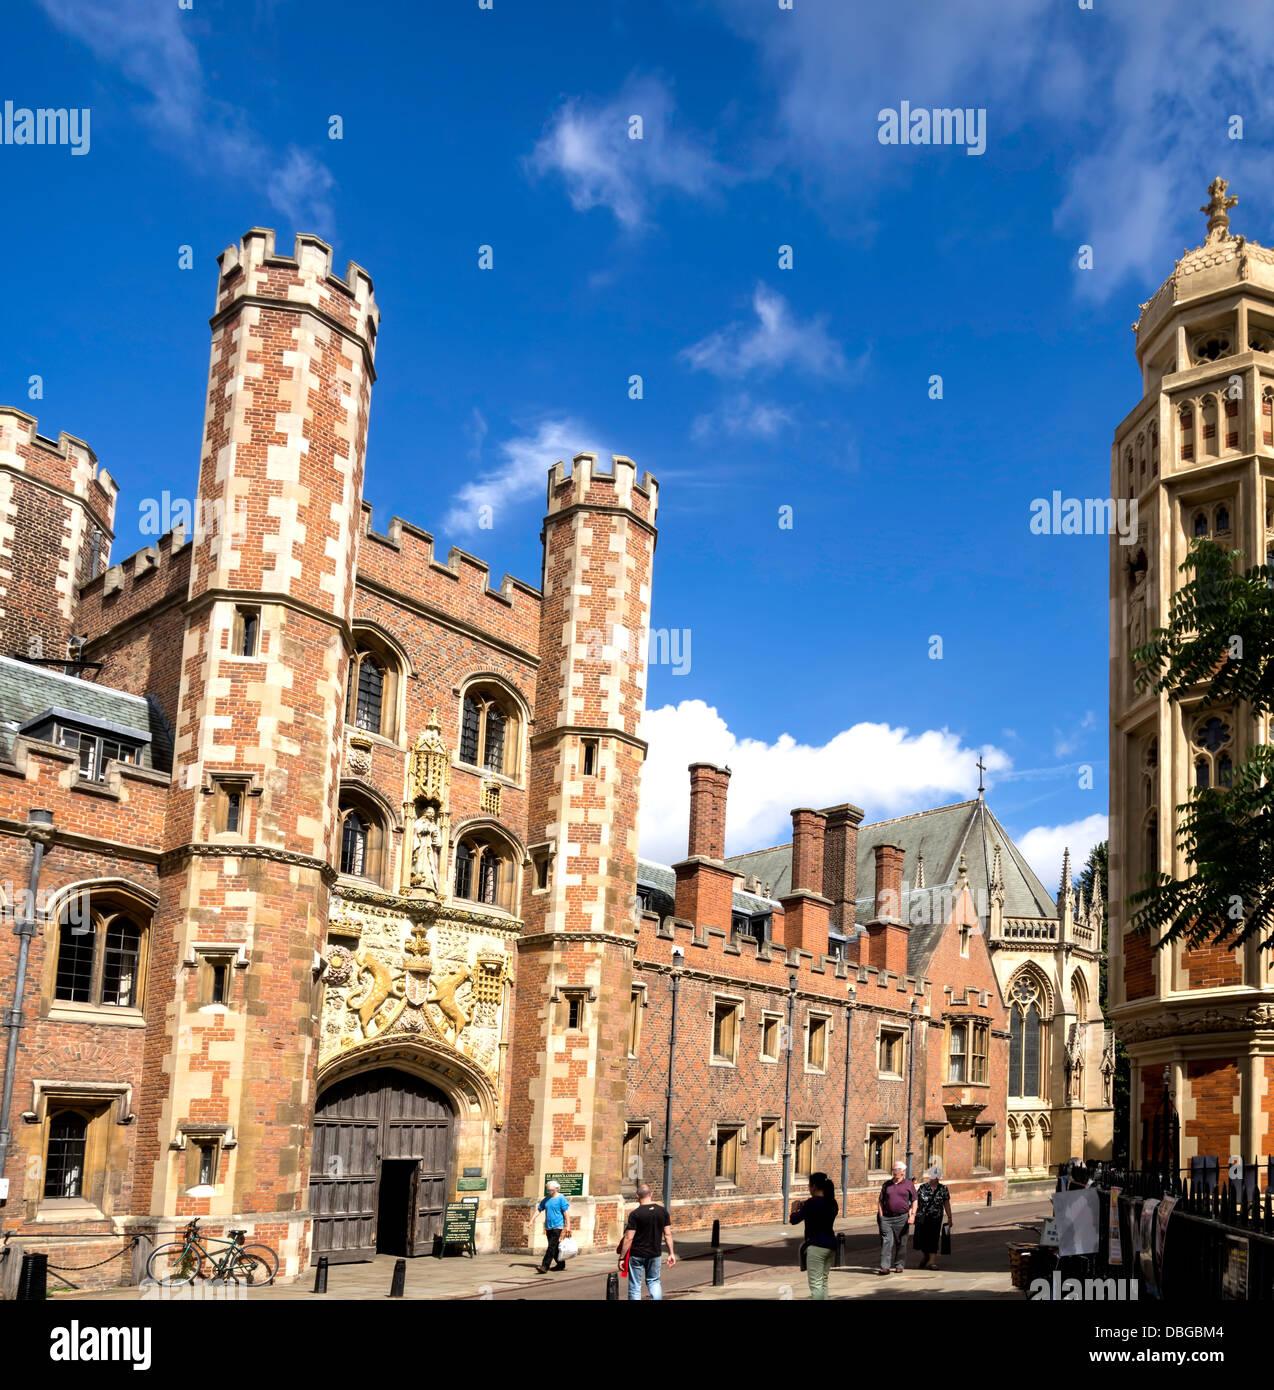 St John's College, part of the University of Cambridge, UK Stock Photo